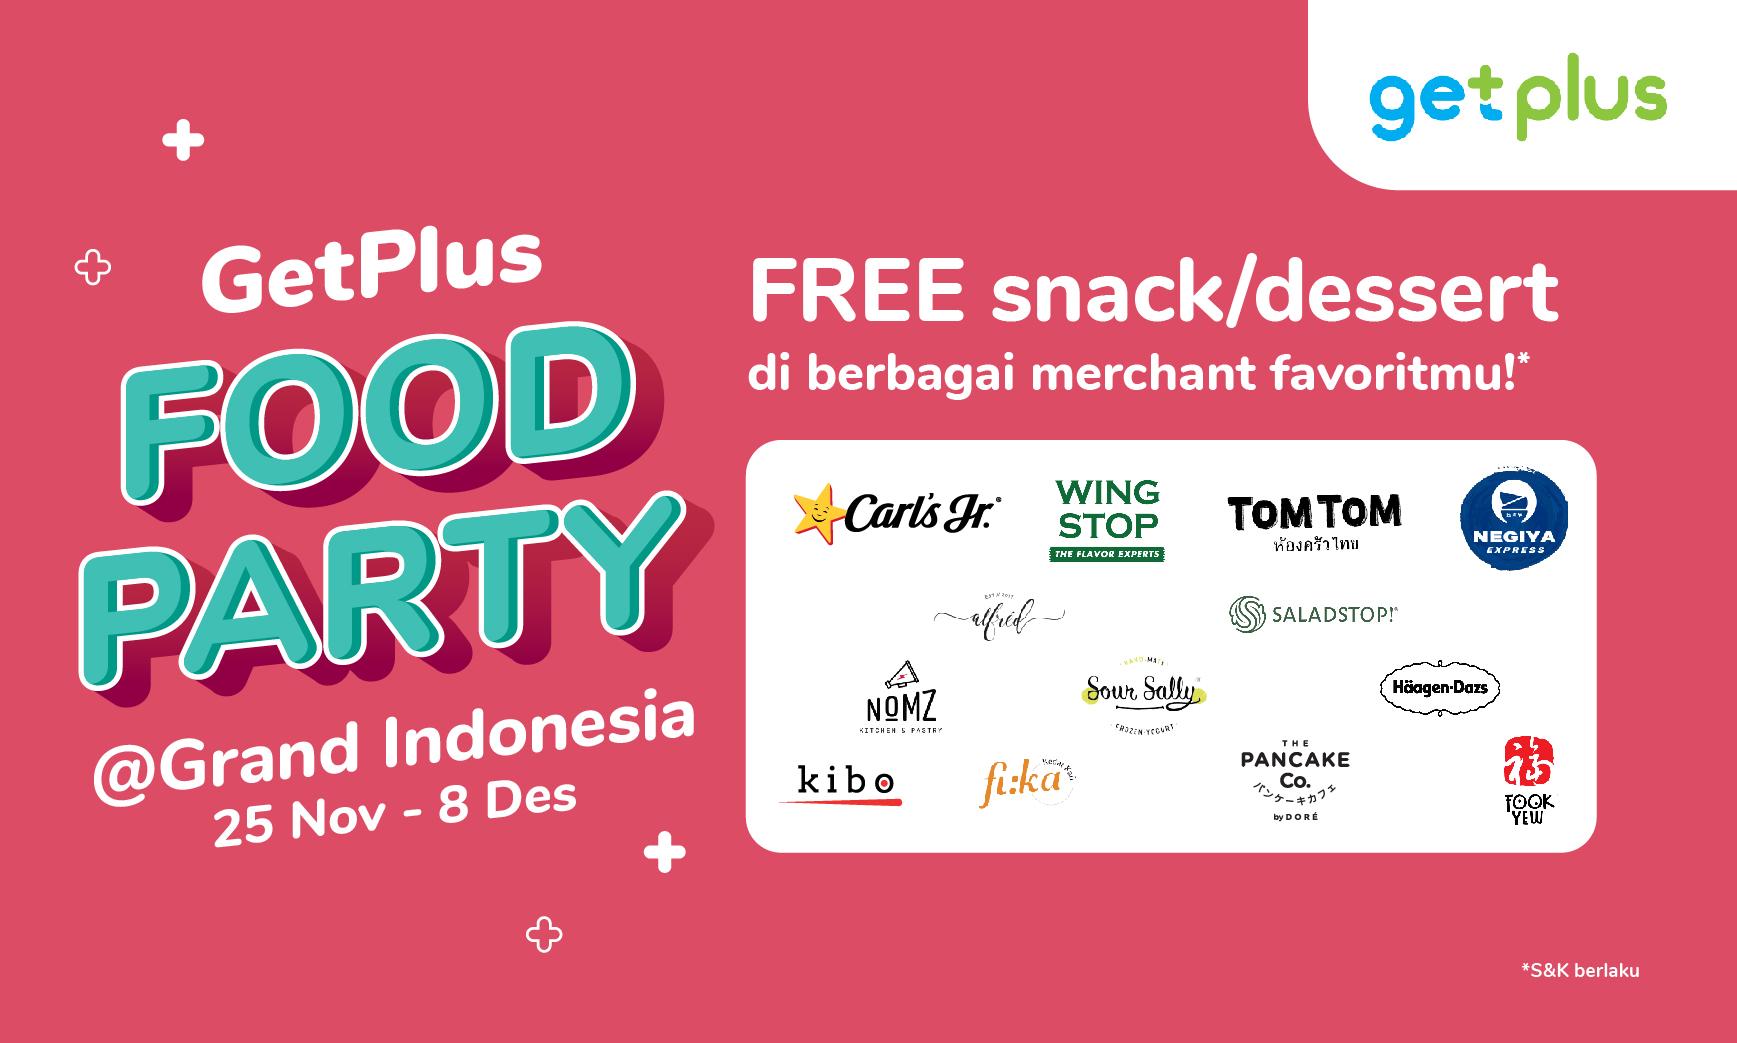 #DapetinLebih Free Snack/Dessert di Food Party Grand Indonesia!